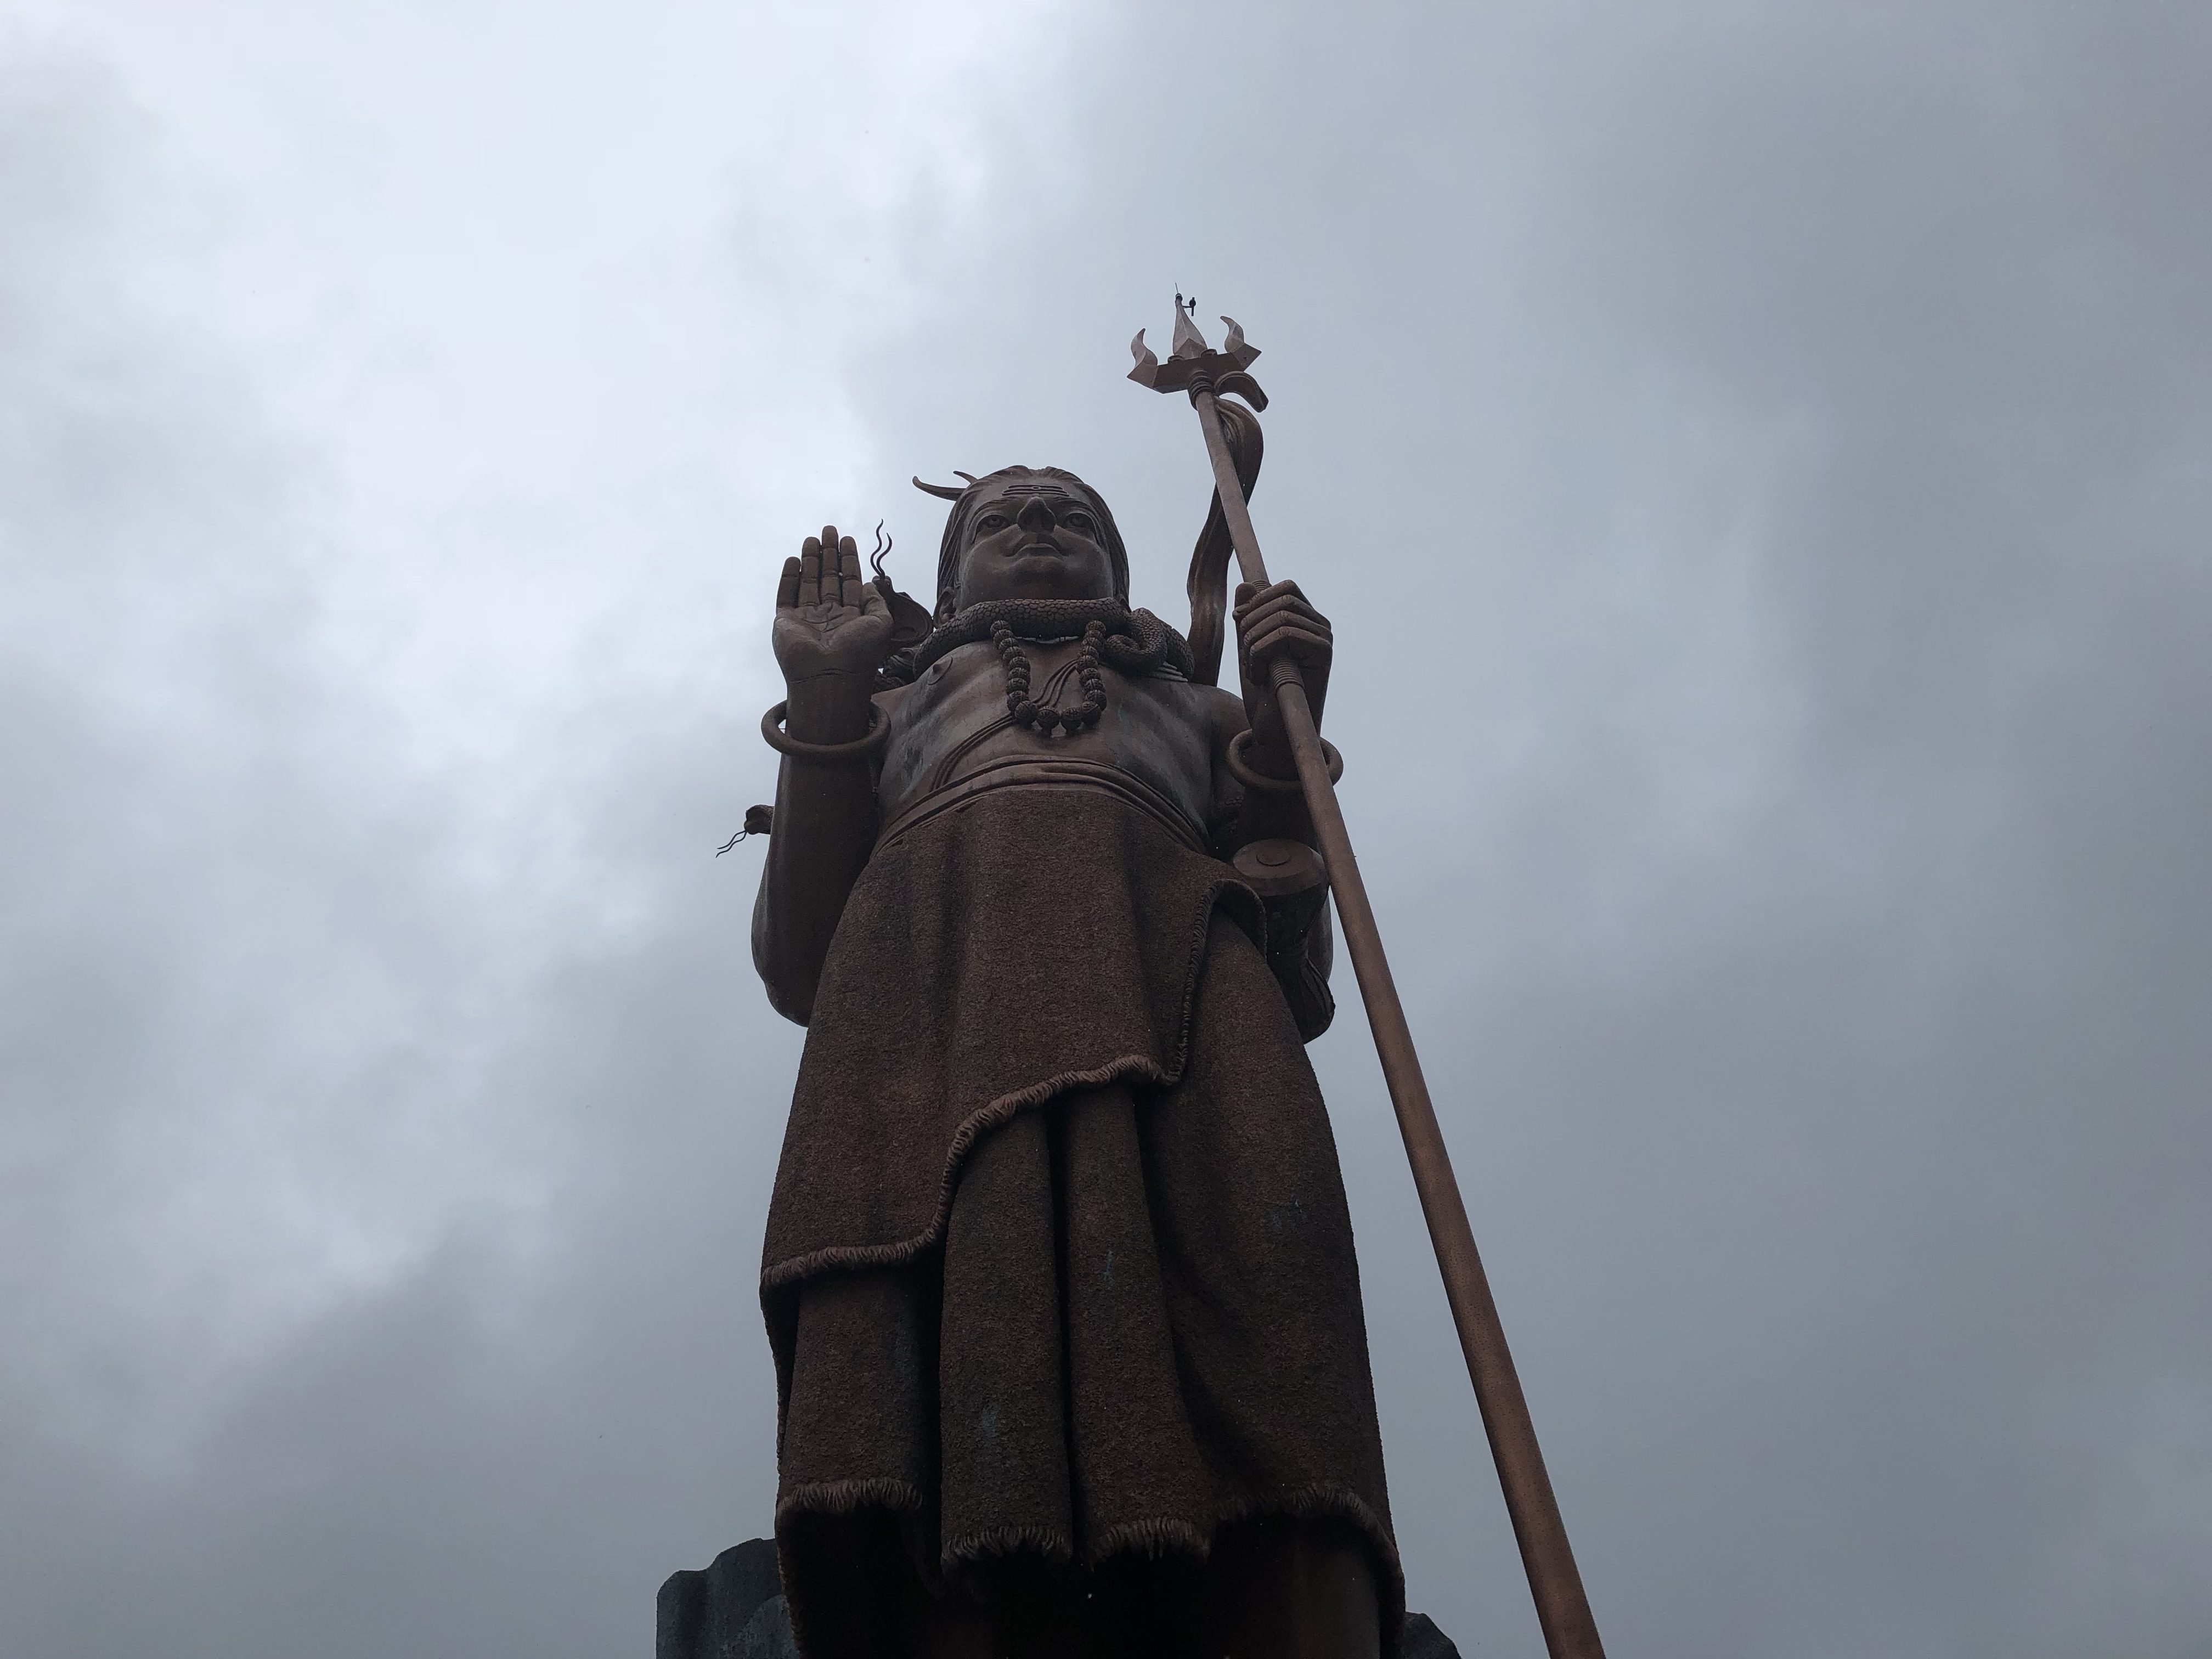 Mahashivaratri : Maurice célèbre la grande nuit de Shiva